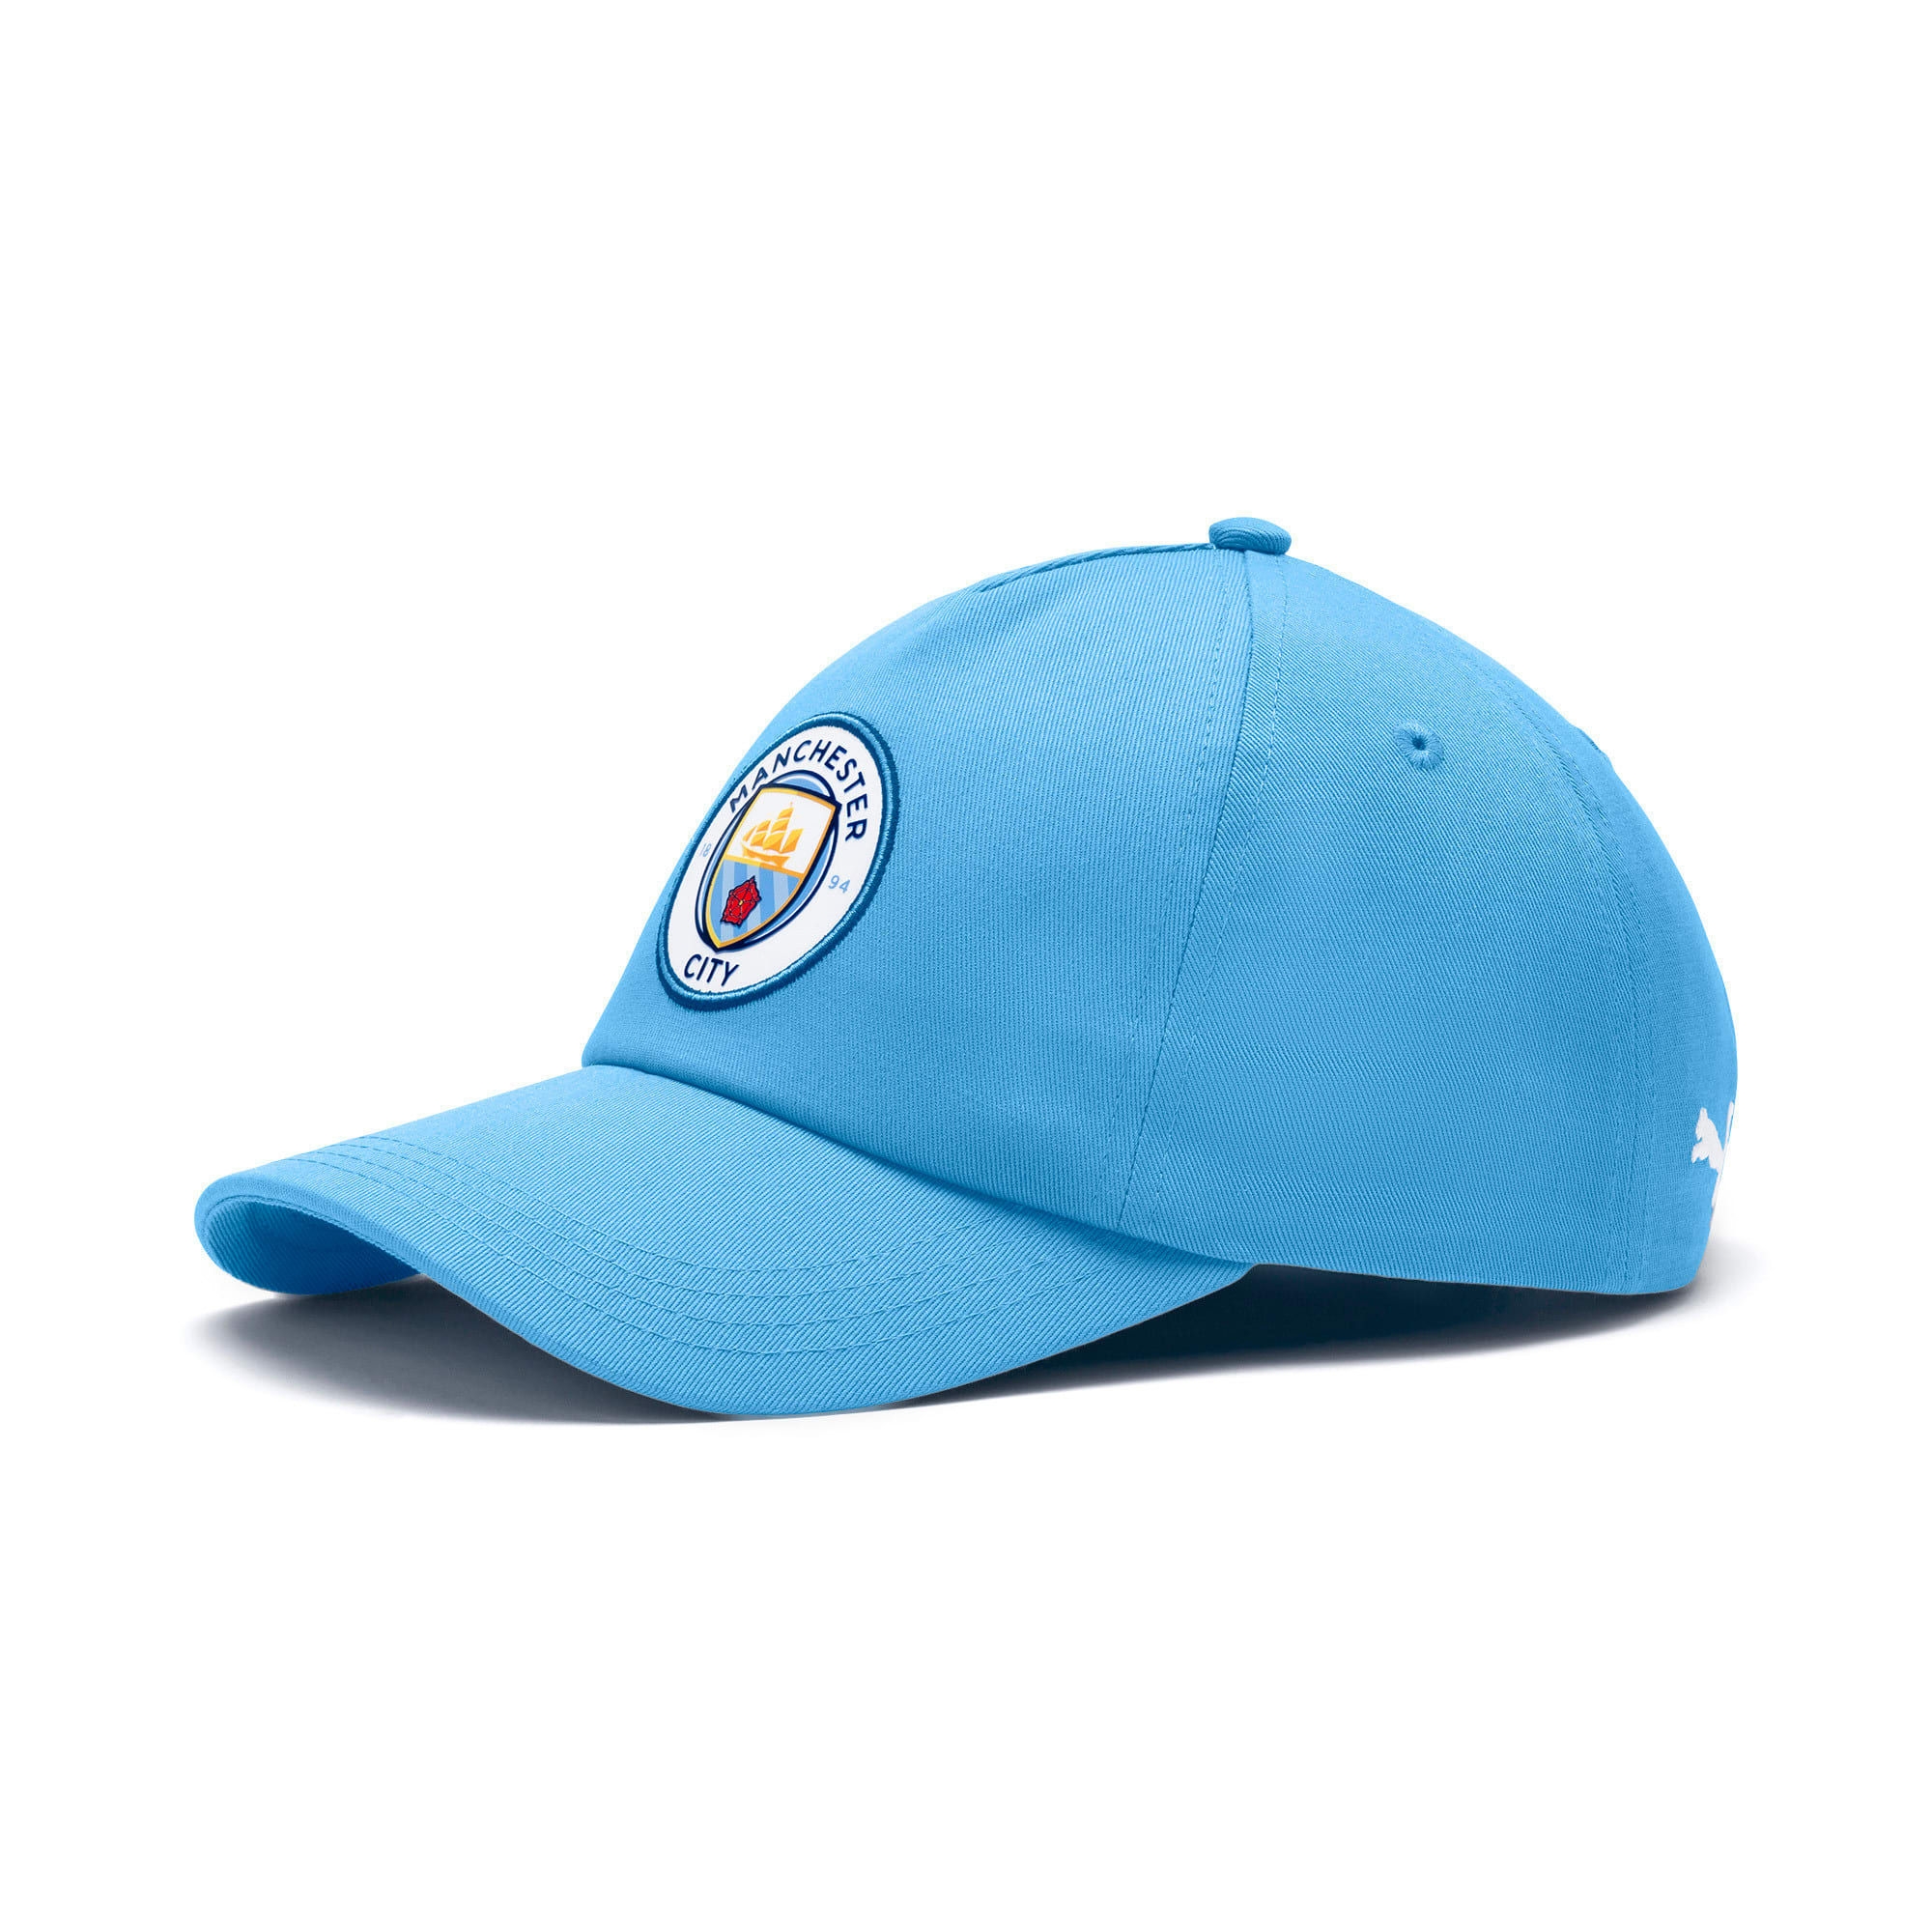 Thumbnail 1 of Man City Team Cap, Team Light Blue-Puma White, medium